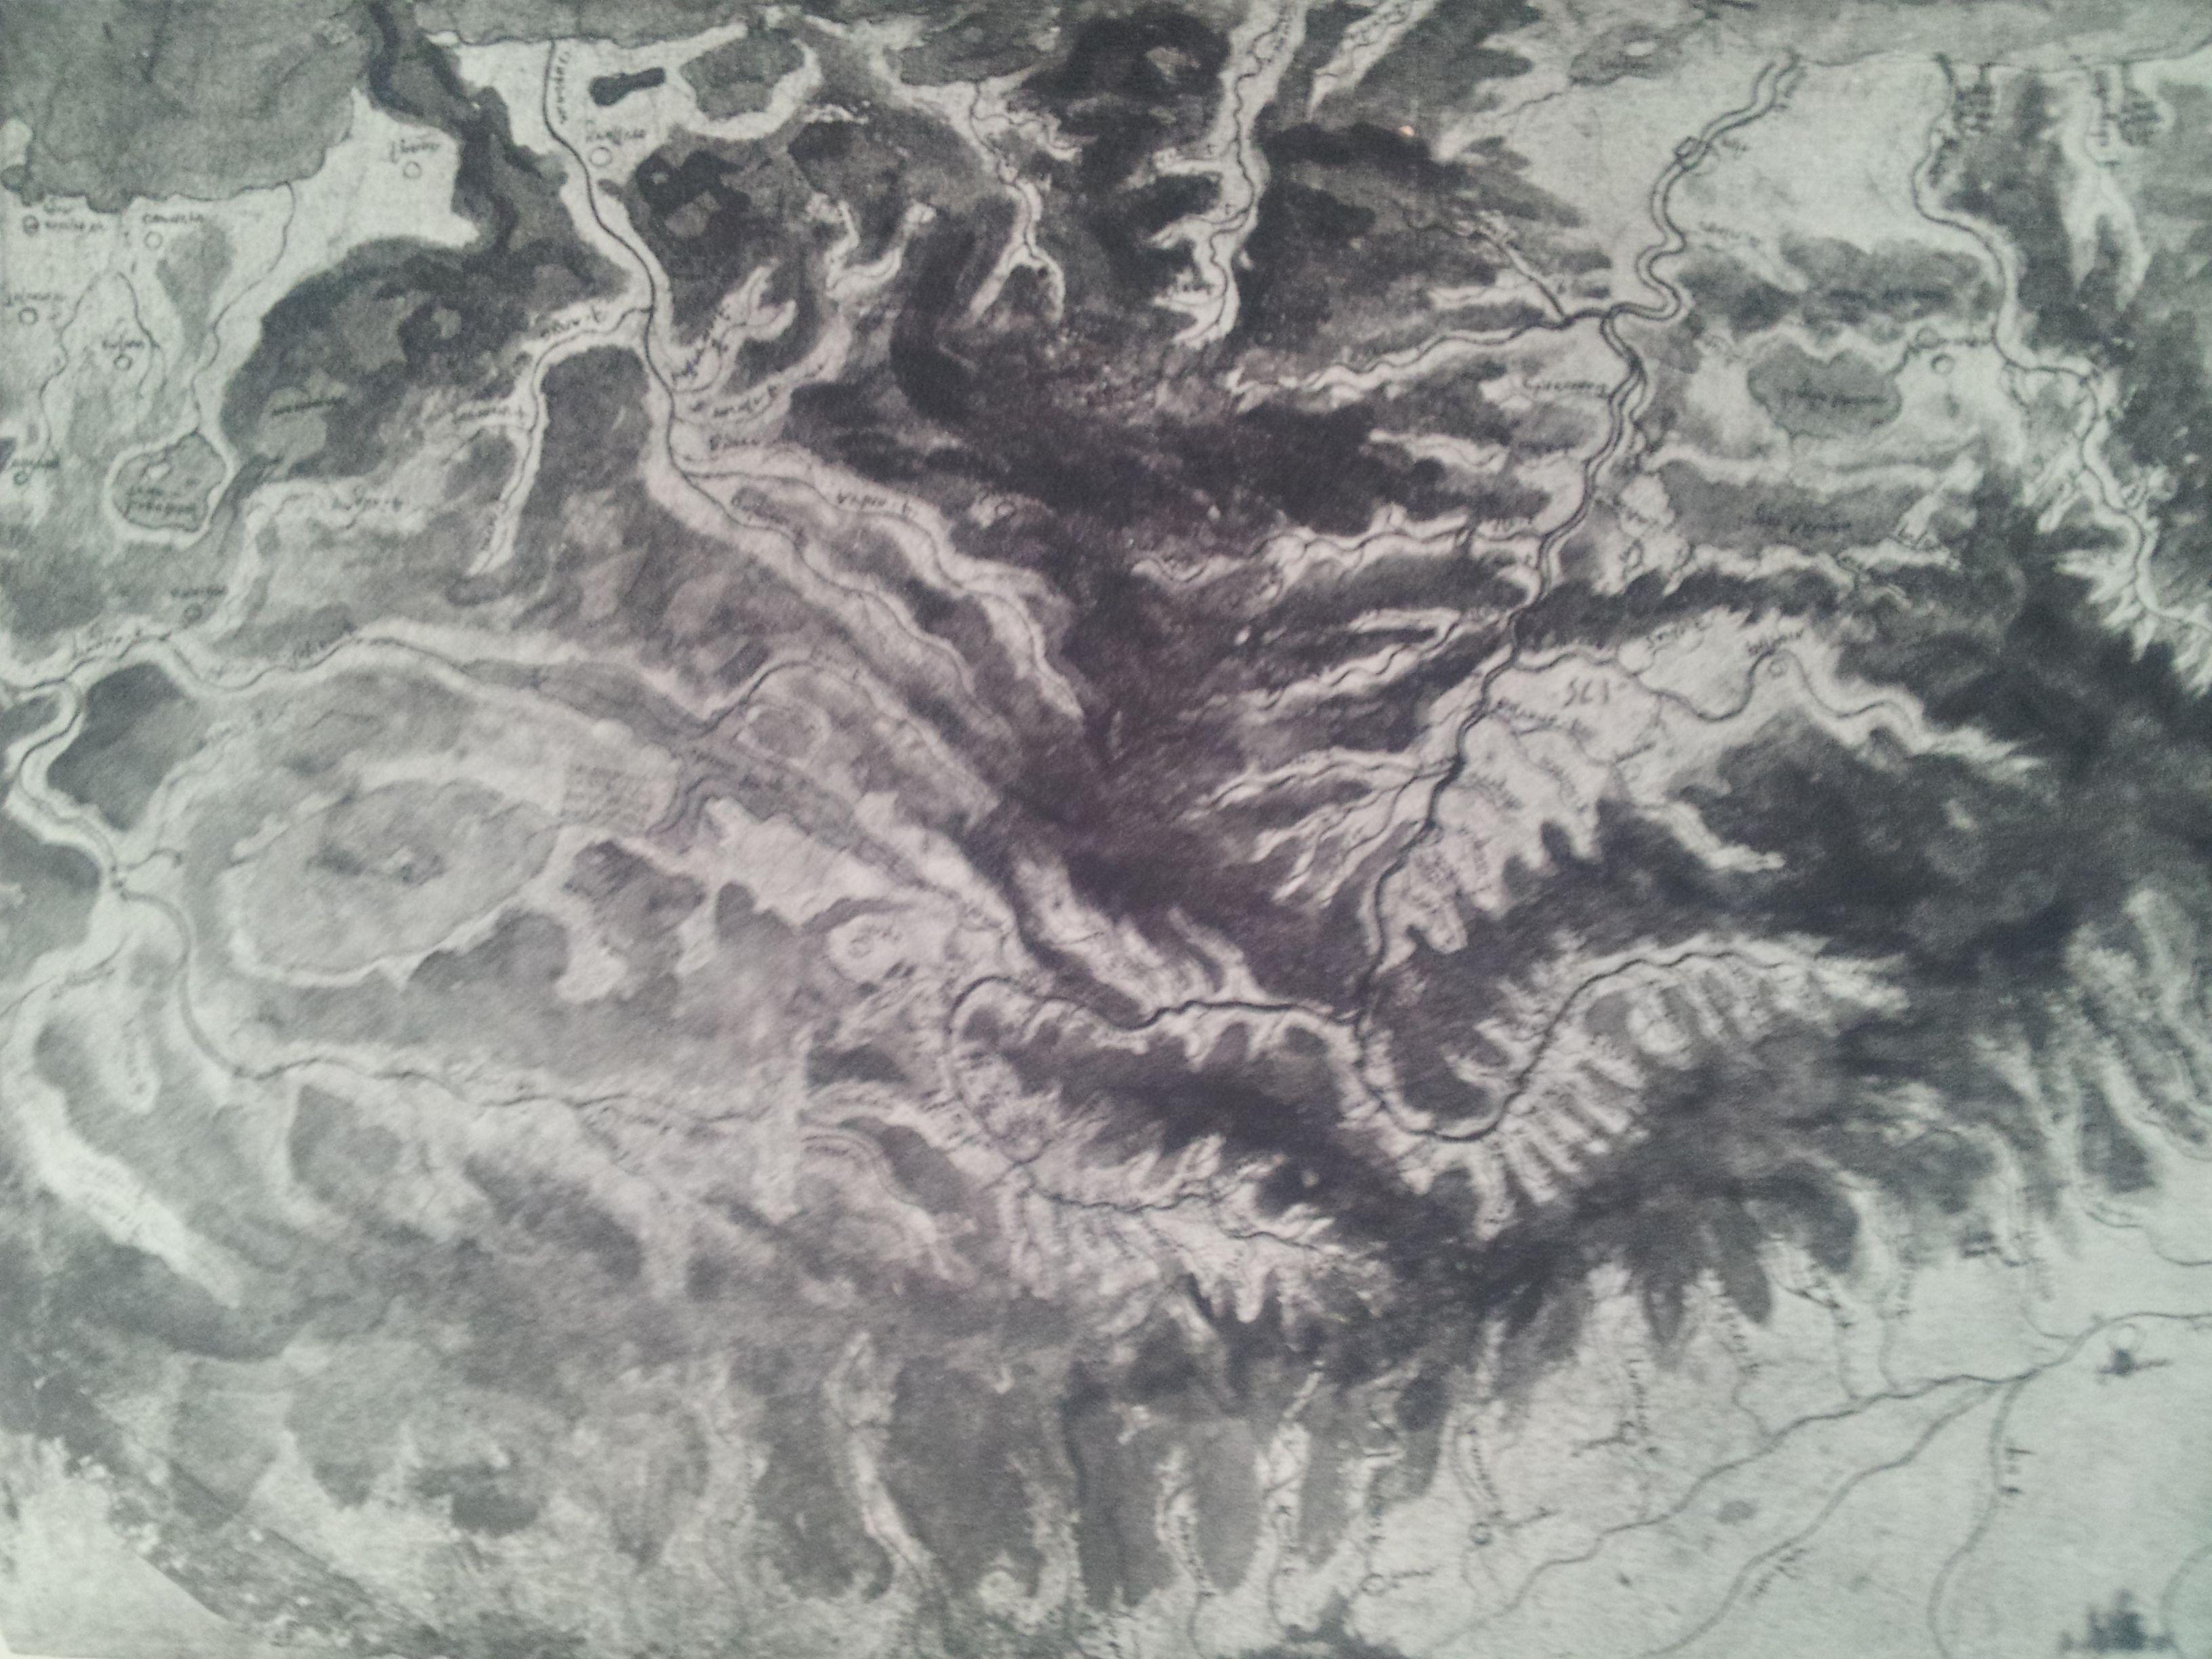 Contour Line Drawing Leonardo Da Vinci : Image result for leonardo da vinci water drawings hair